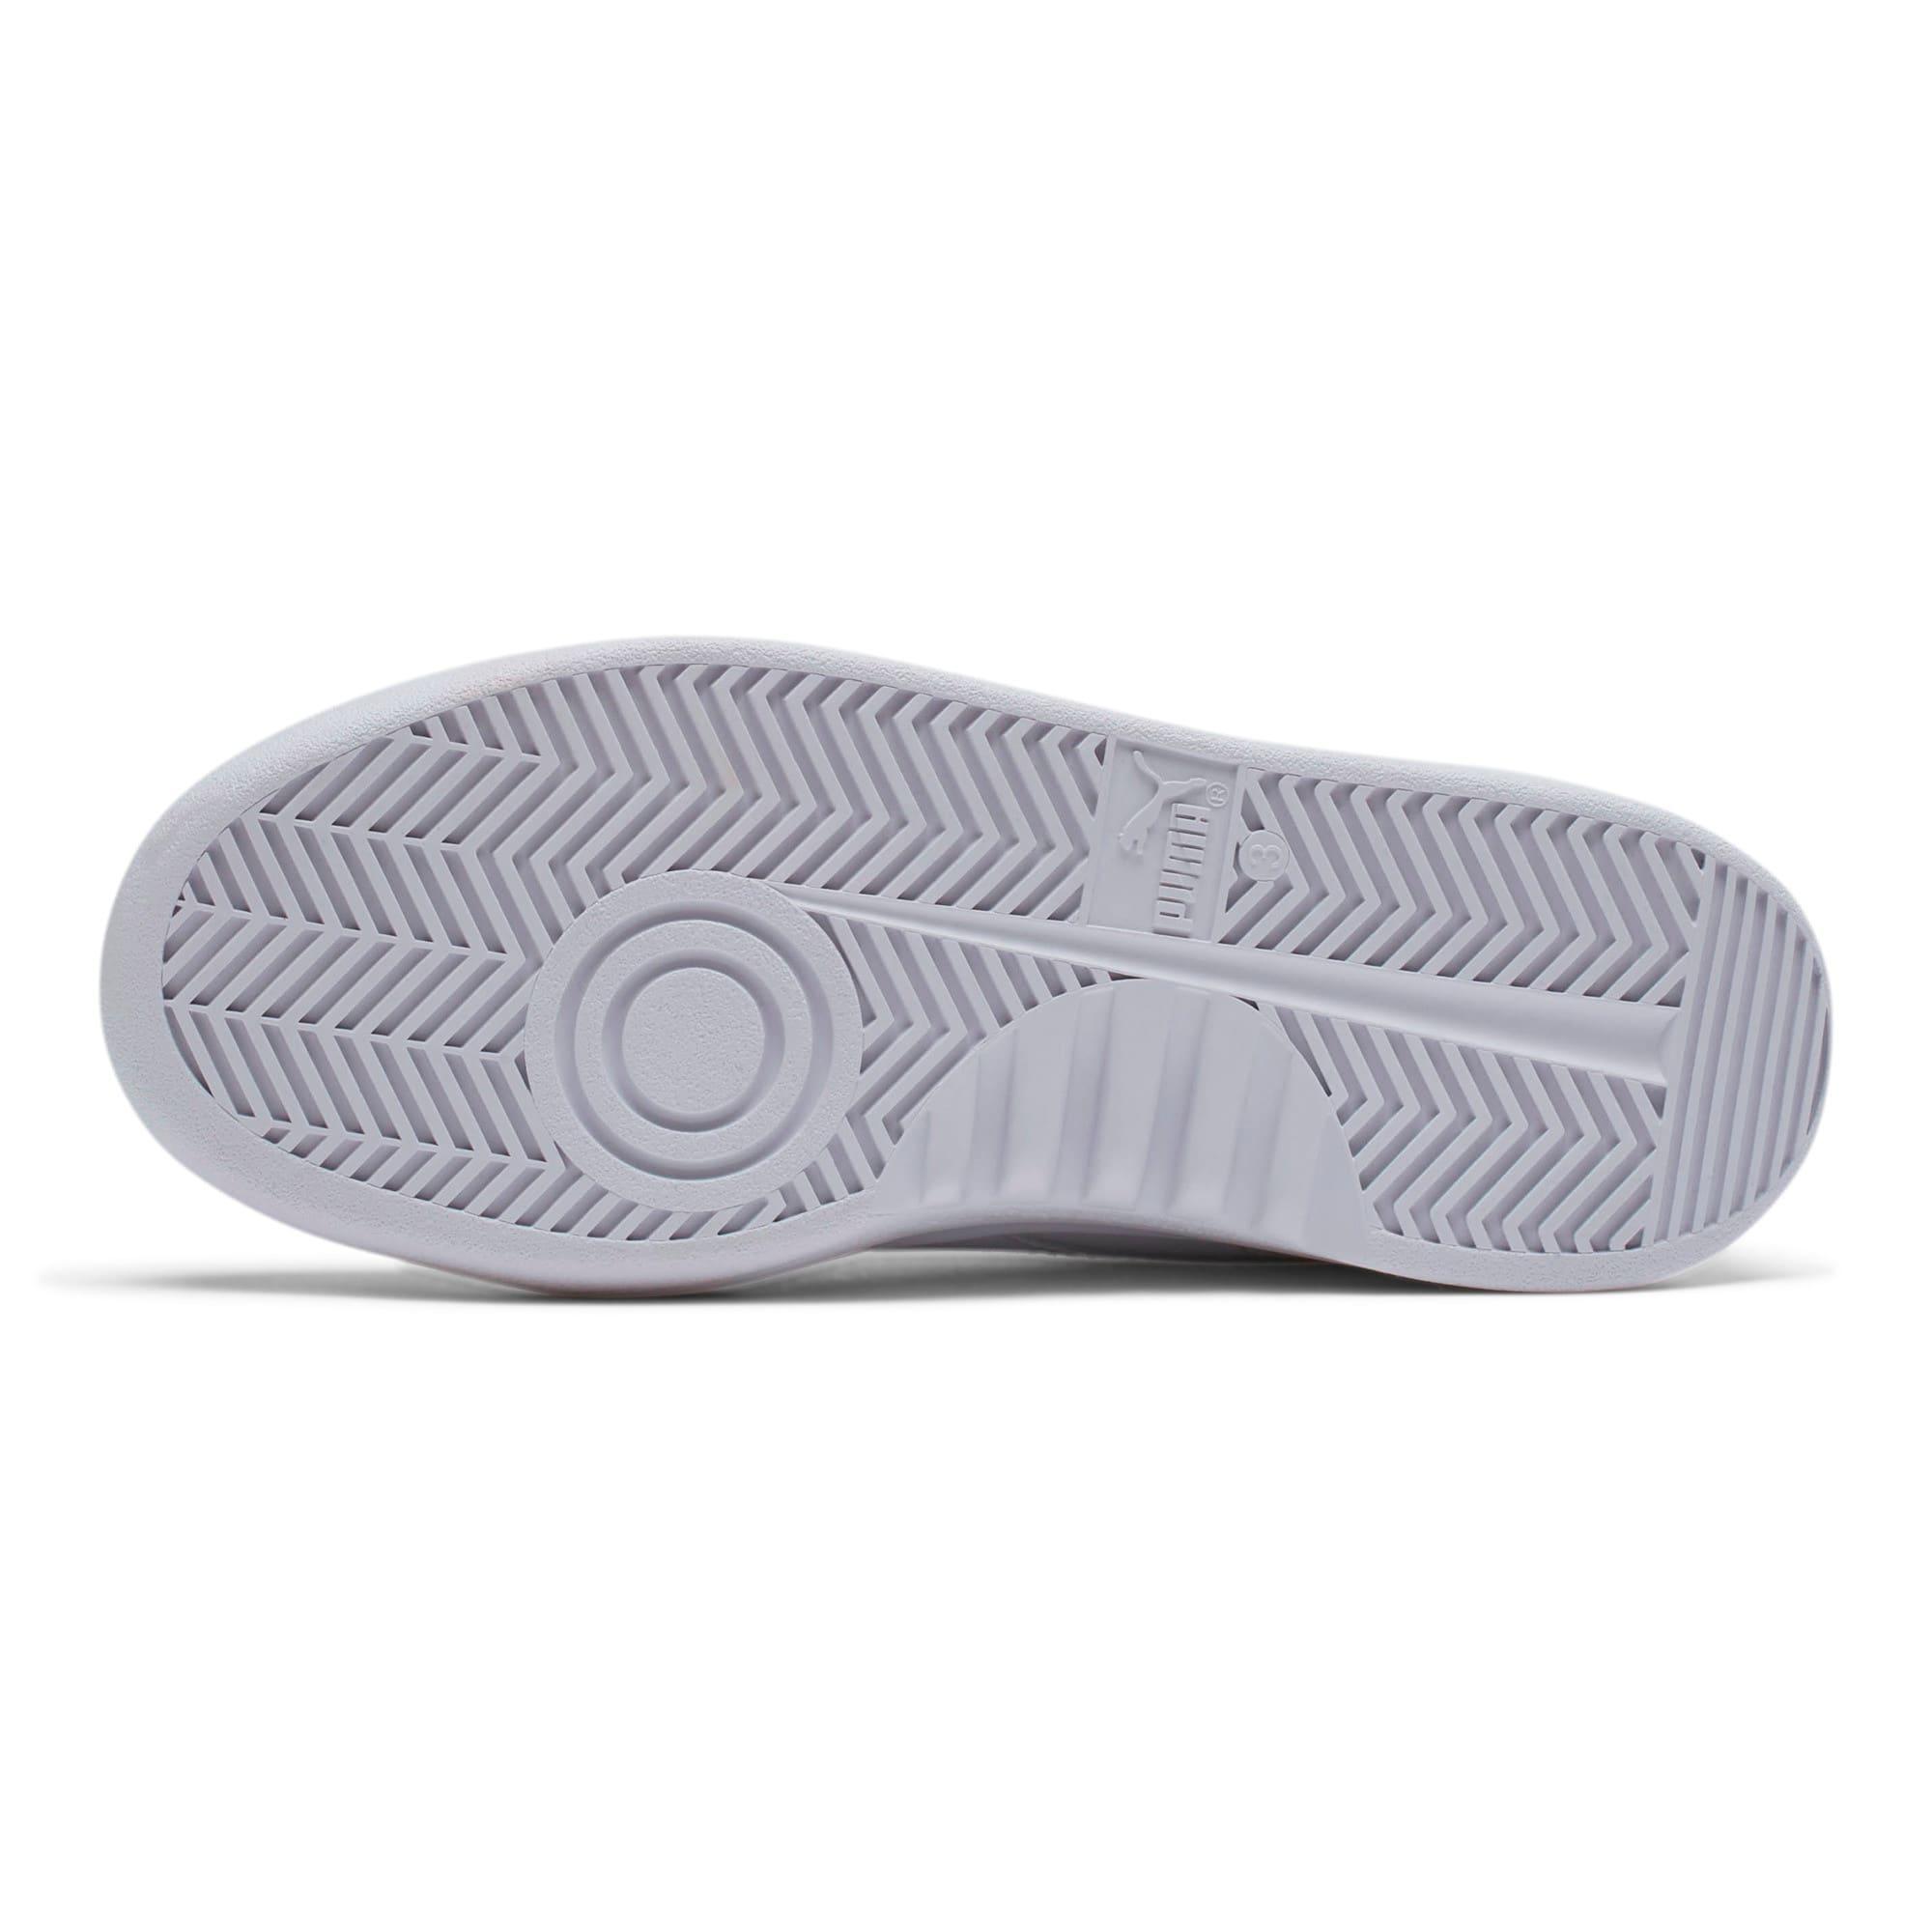 Thumbnail 3 of GV Special Sneakers JR, Puma White-Puma Team Gold, medium